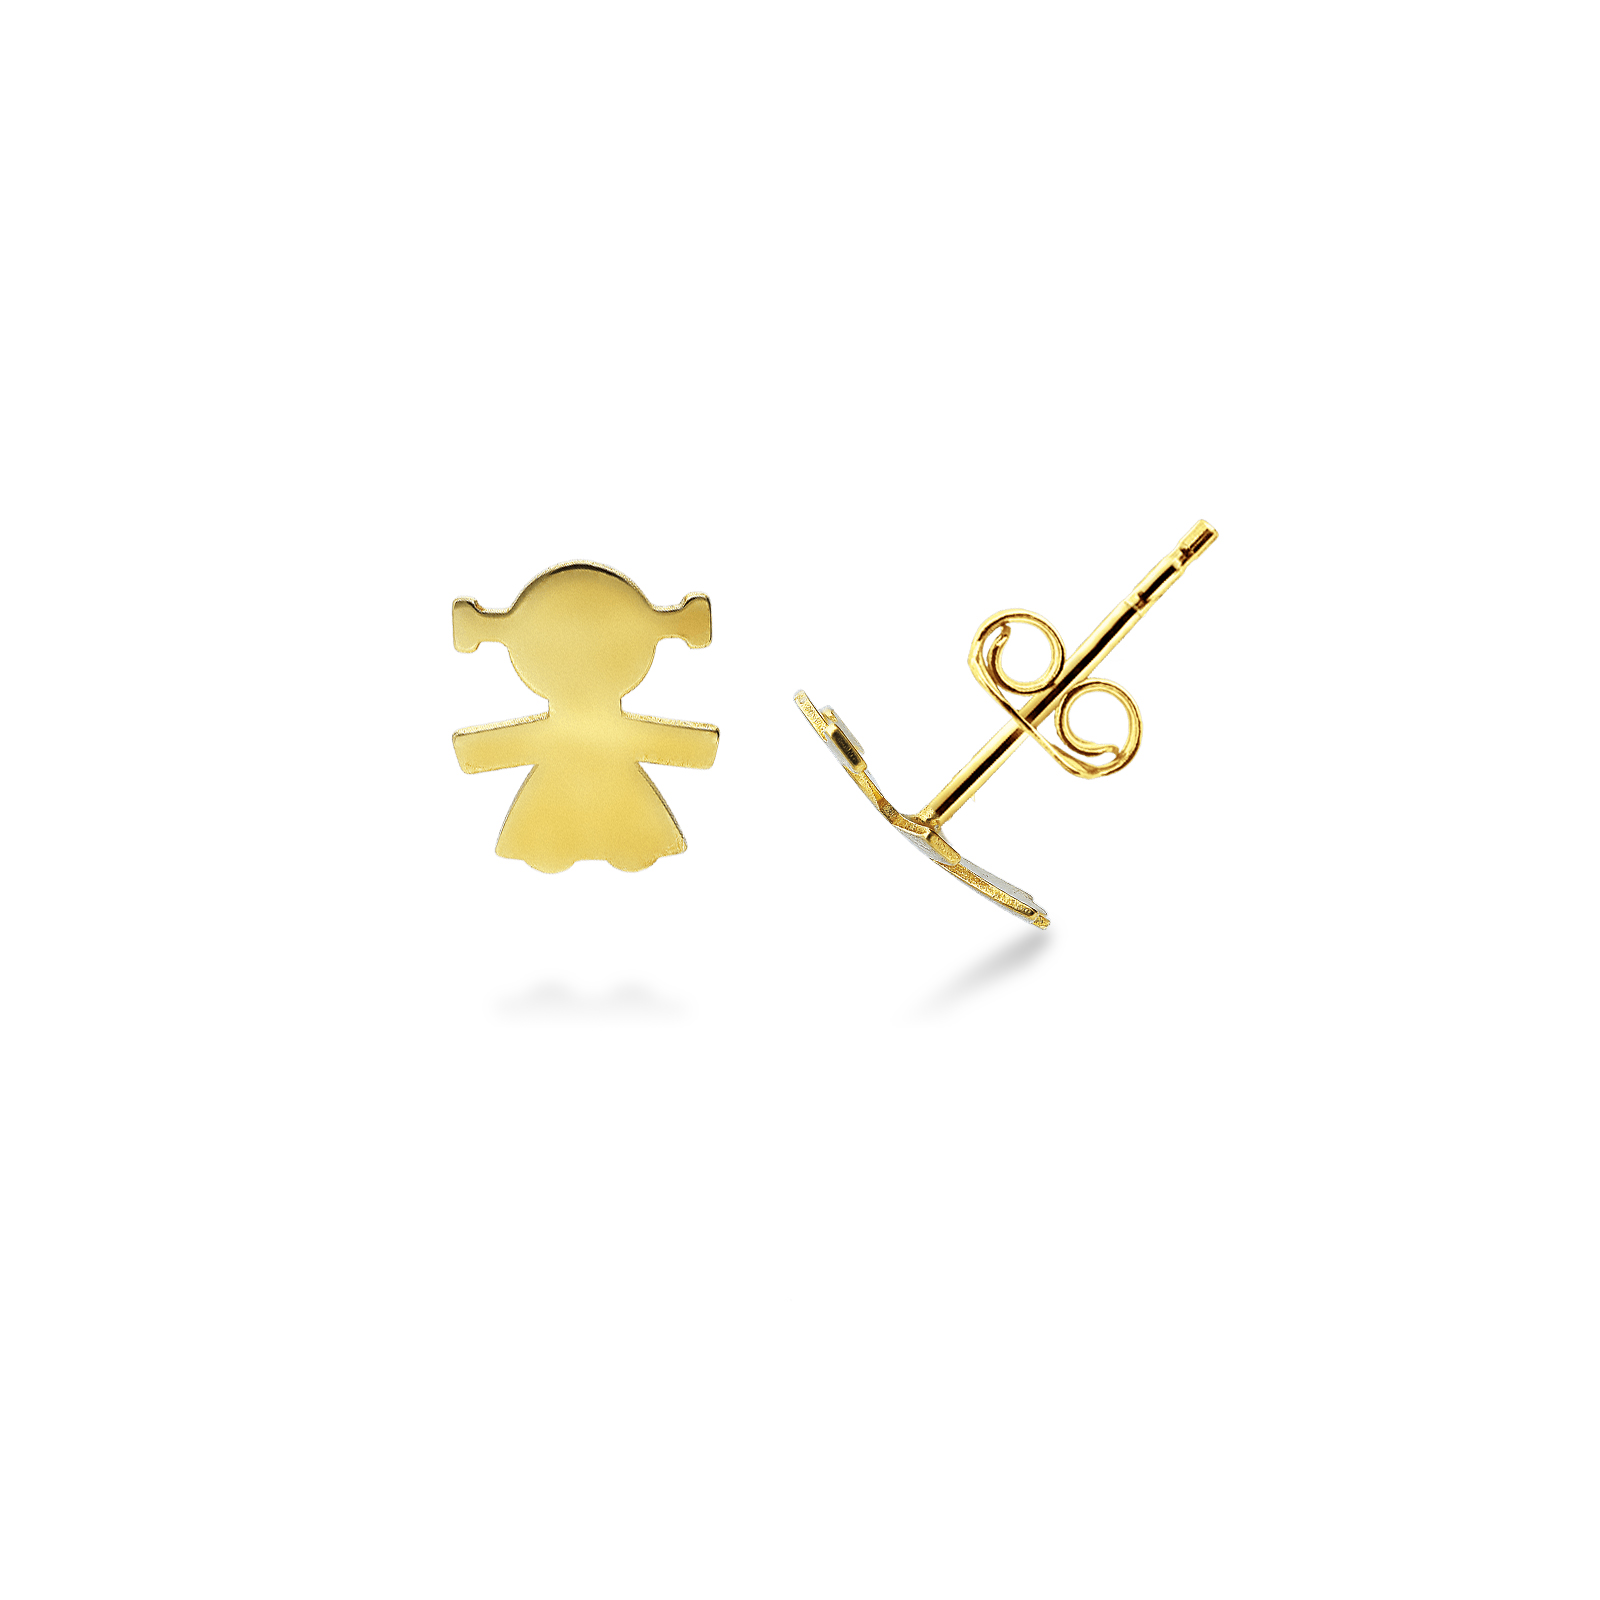 Earrings 18k Gold with Girl